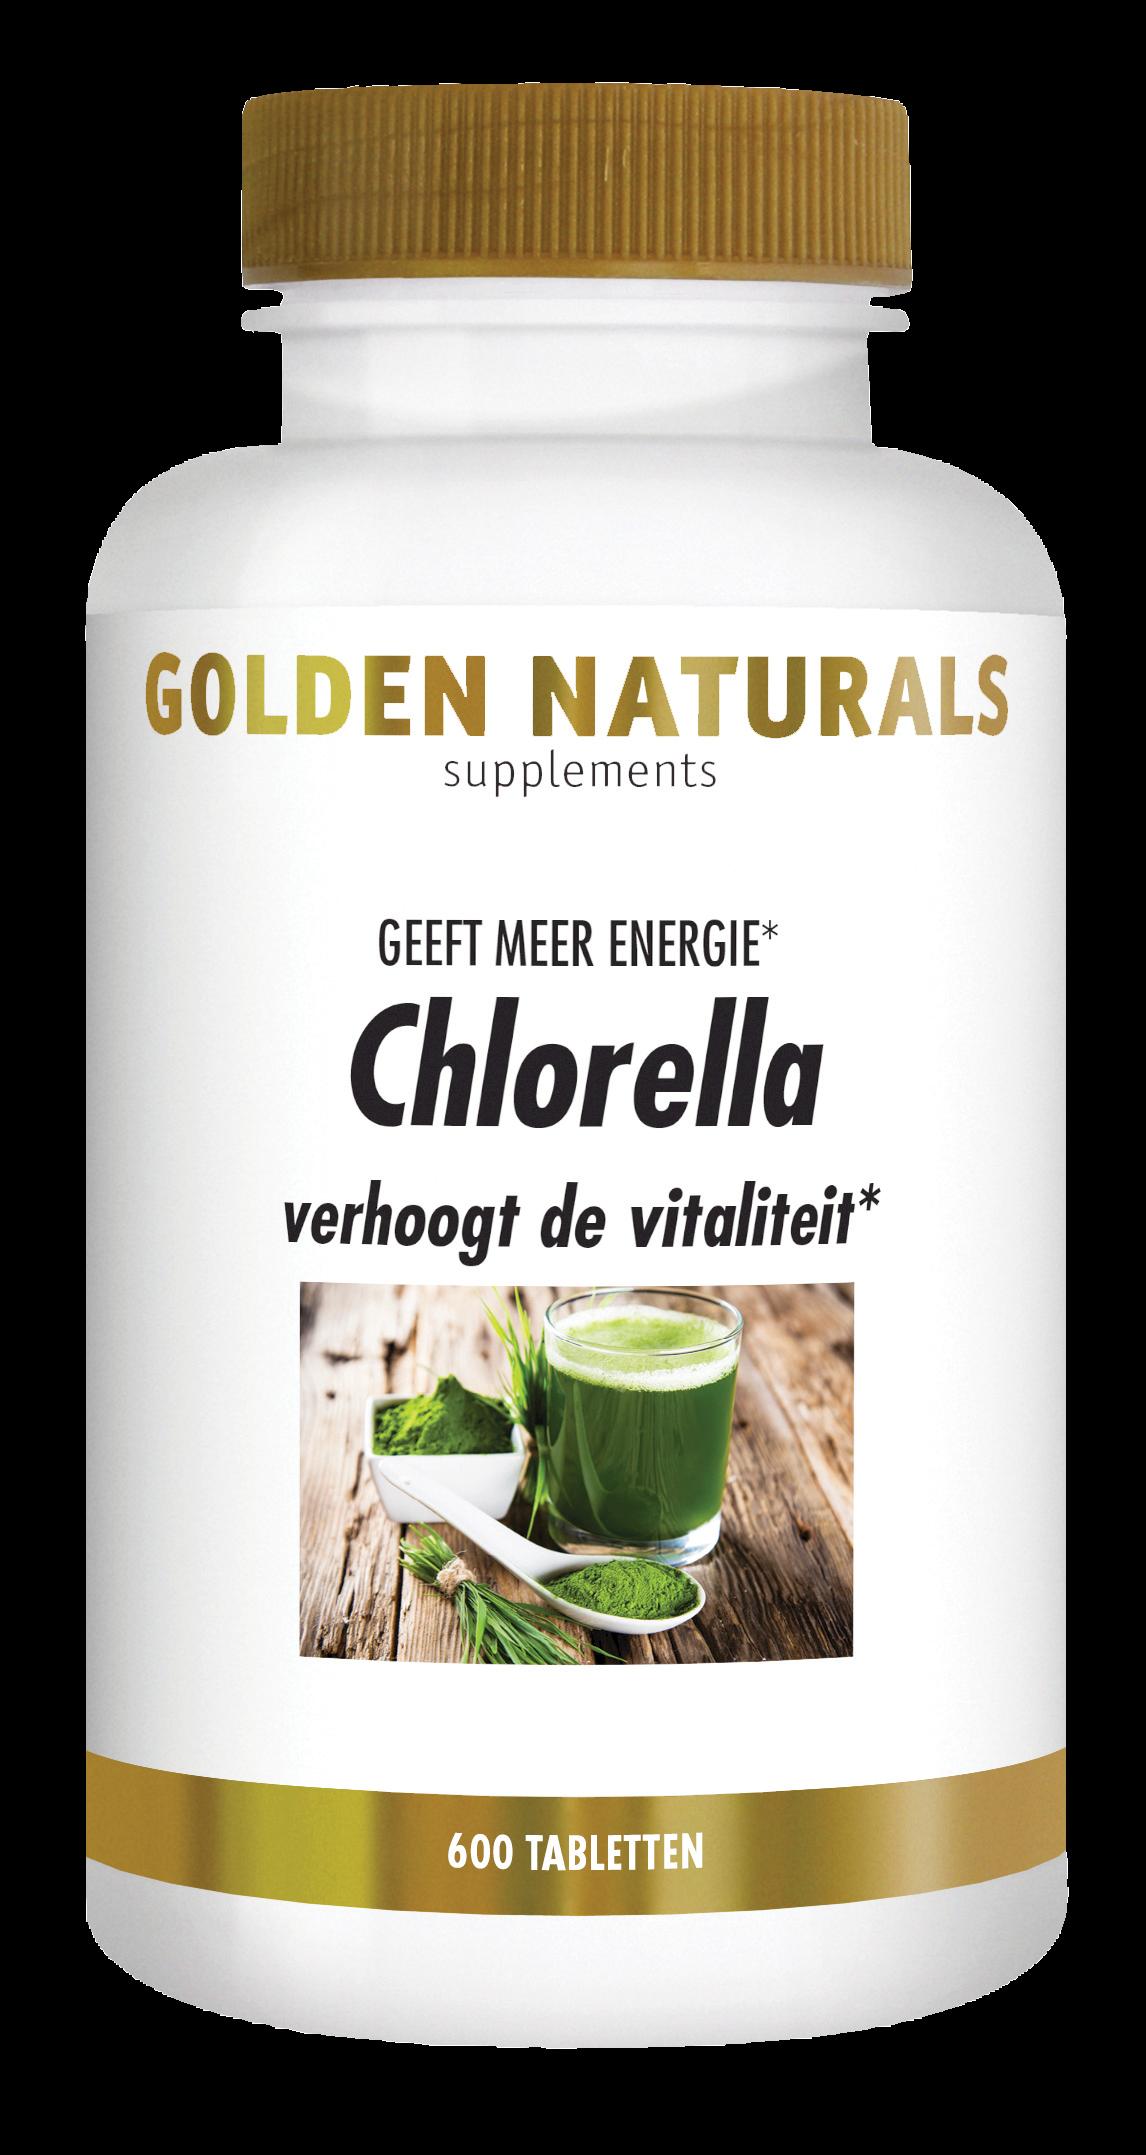 Golden Naturals Chlorella (600 veganistische tabletten)